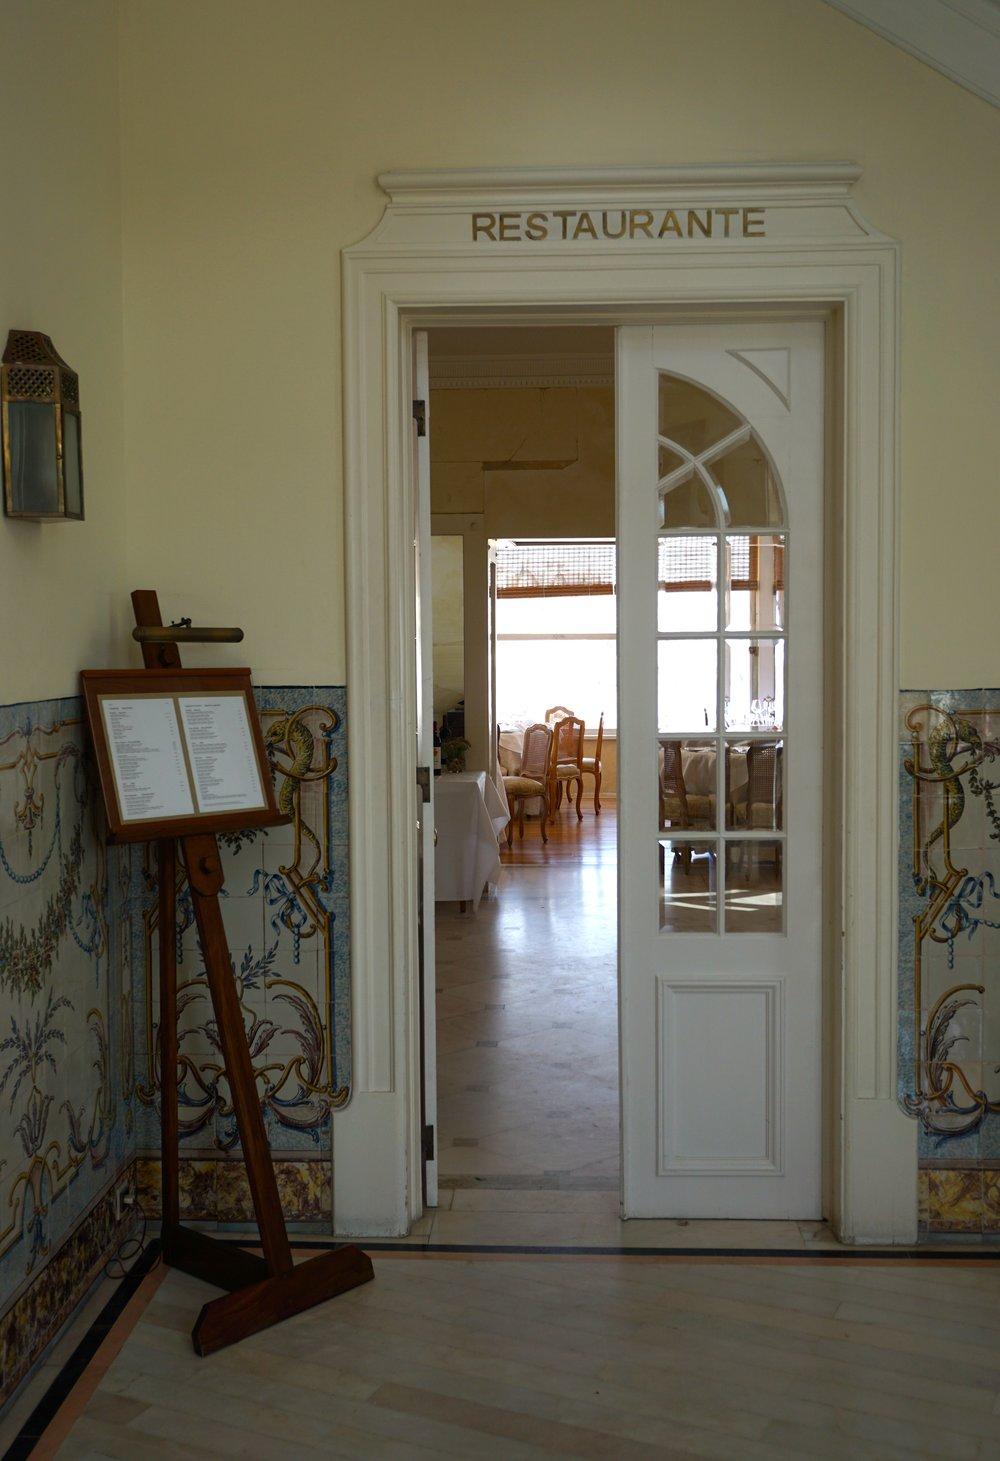 Restaurant im Hotel Albatroz